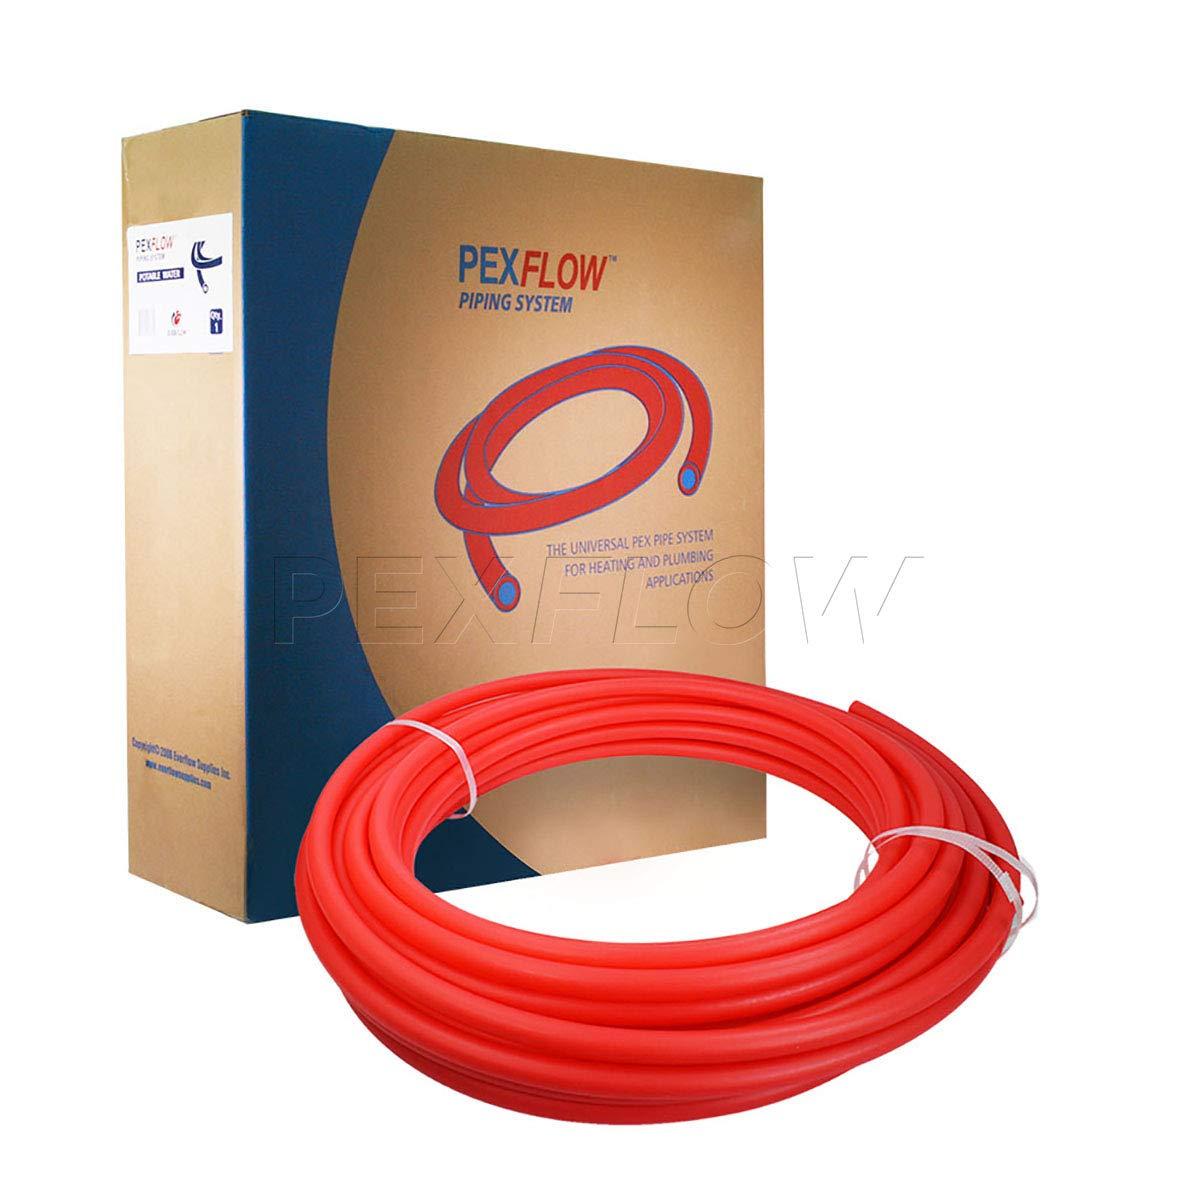 100 ft Pexflow PFW-R34100 Potable Water Pex tubing Red